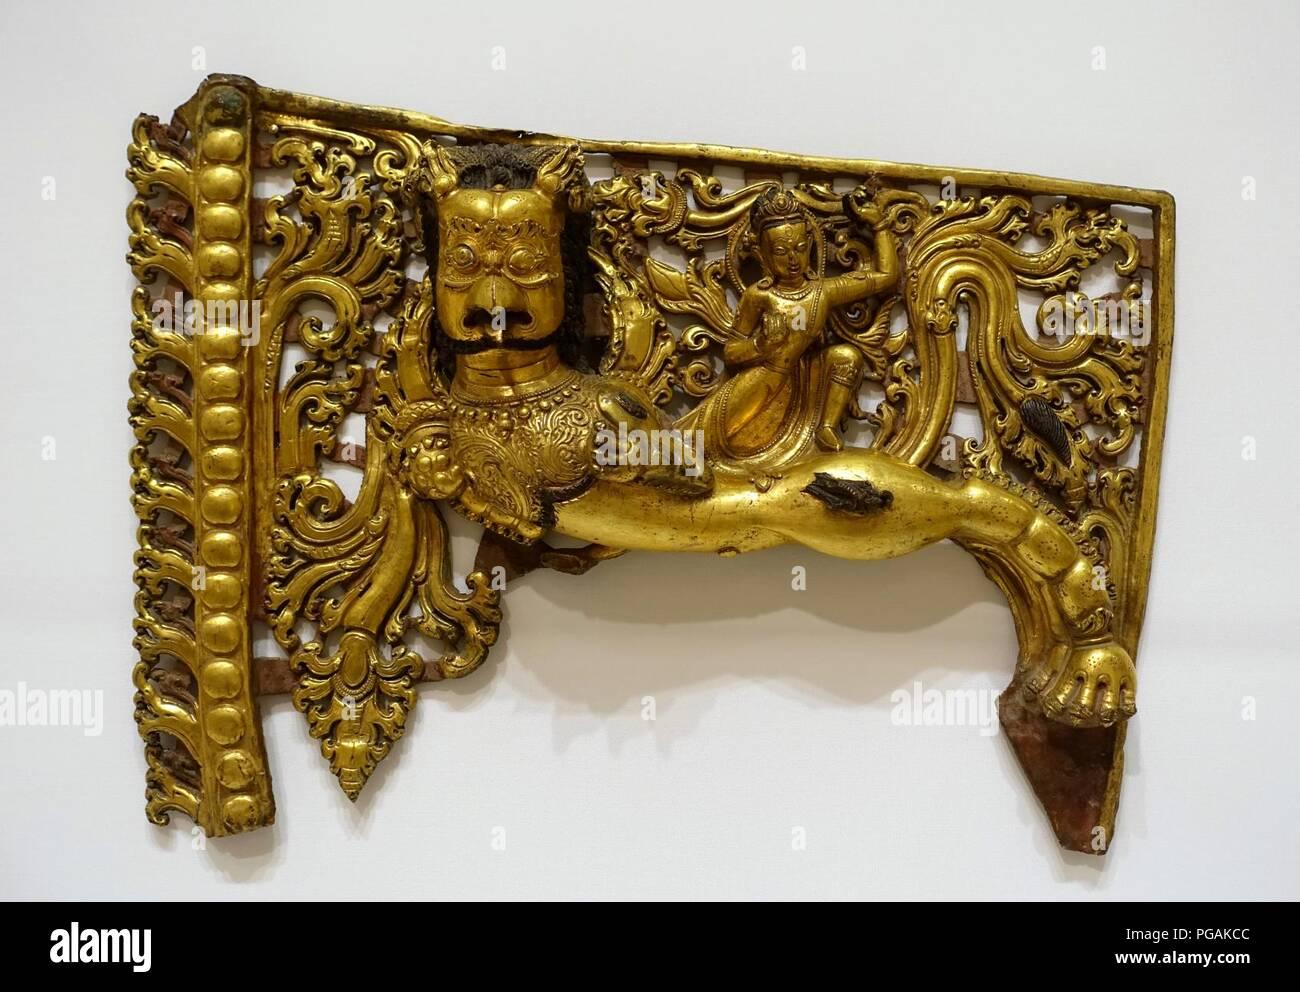 Aureole crossbar mit Garuda, Tibet, 1500s-1600s AD, vergoldetem Metall Stockbild